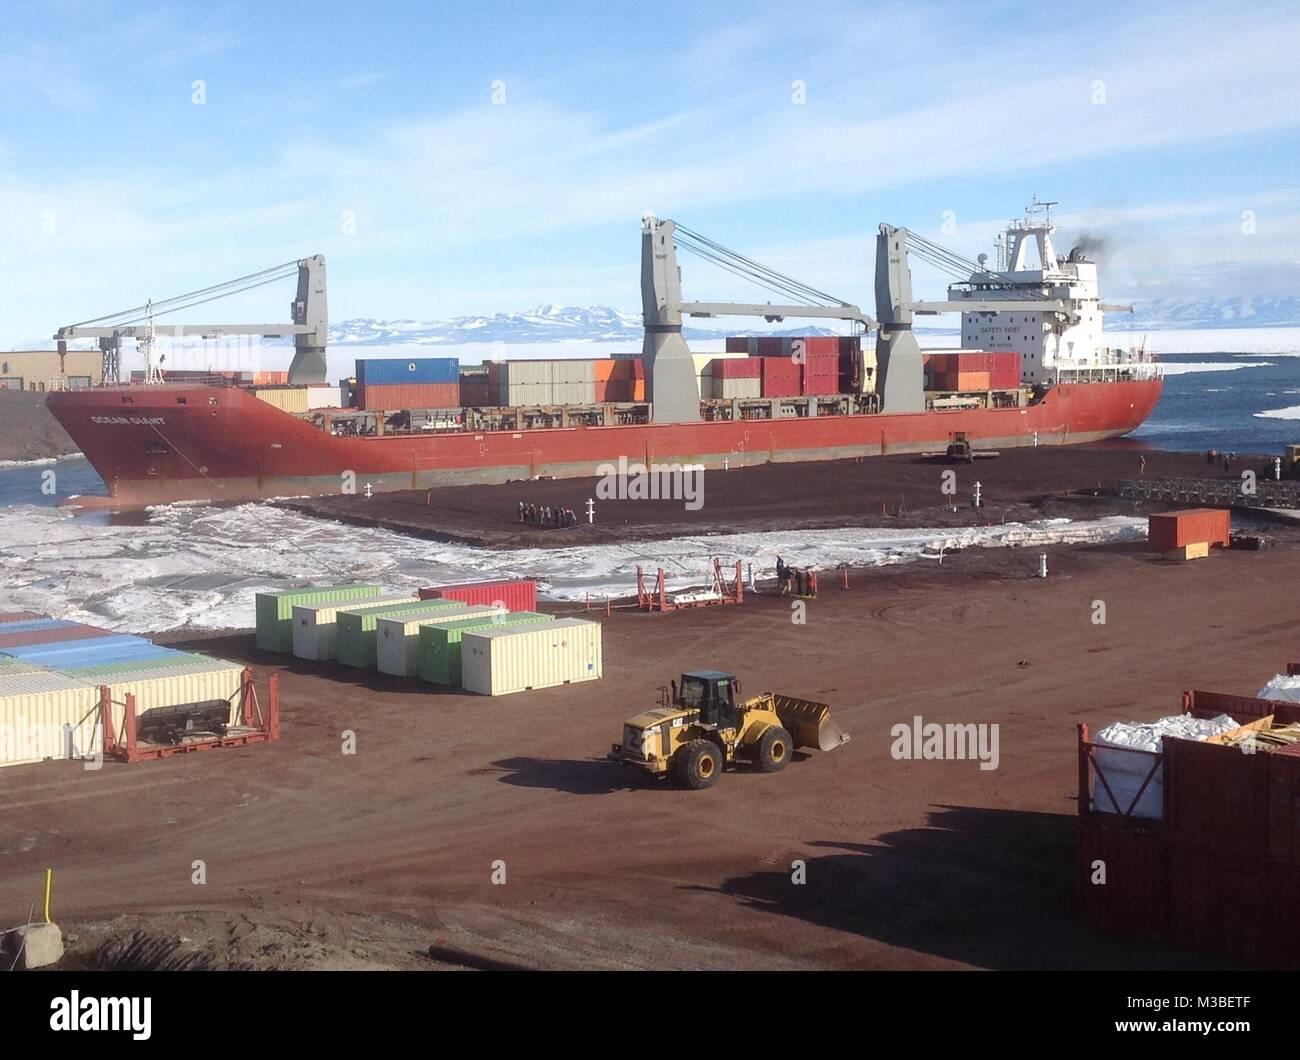 Antarctica Mcmurdo Station Stockfotos & Antarctica Mcmurdo Station ...